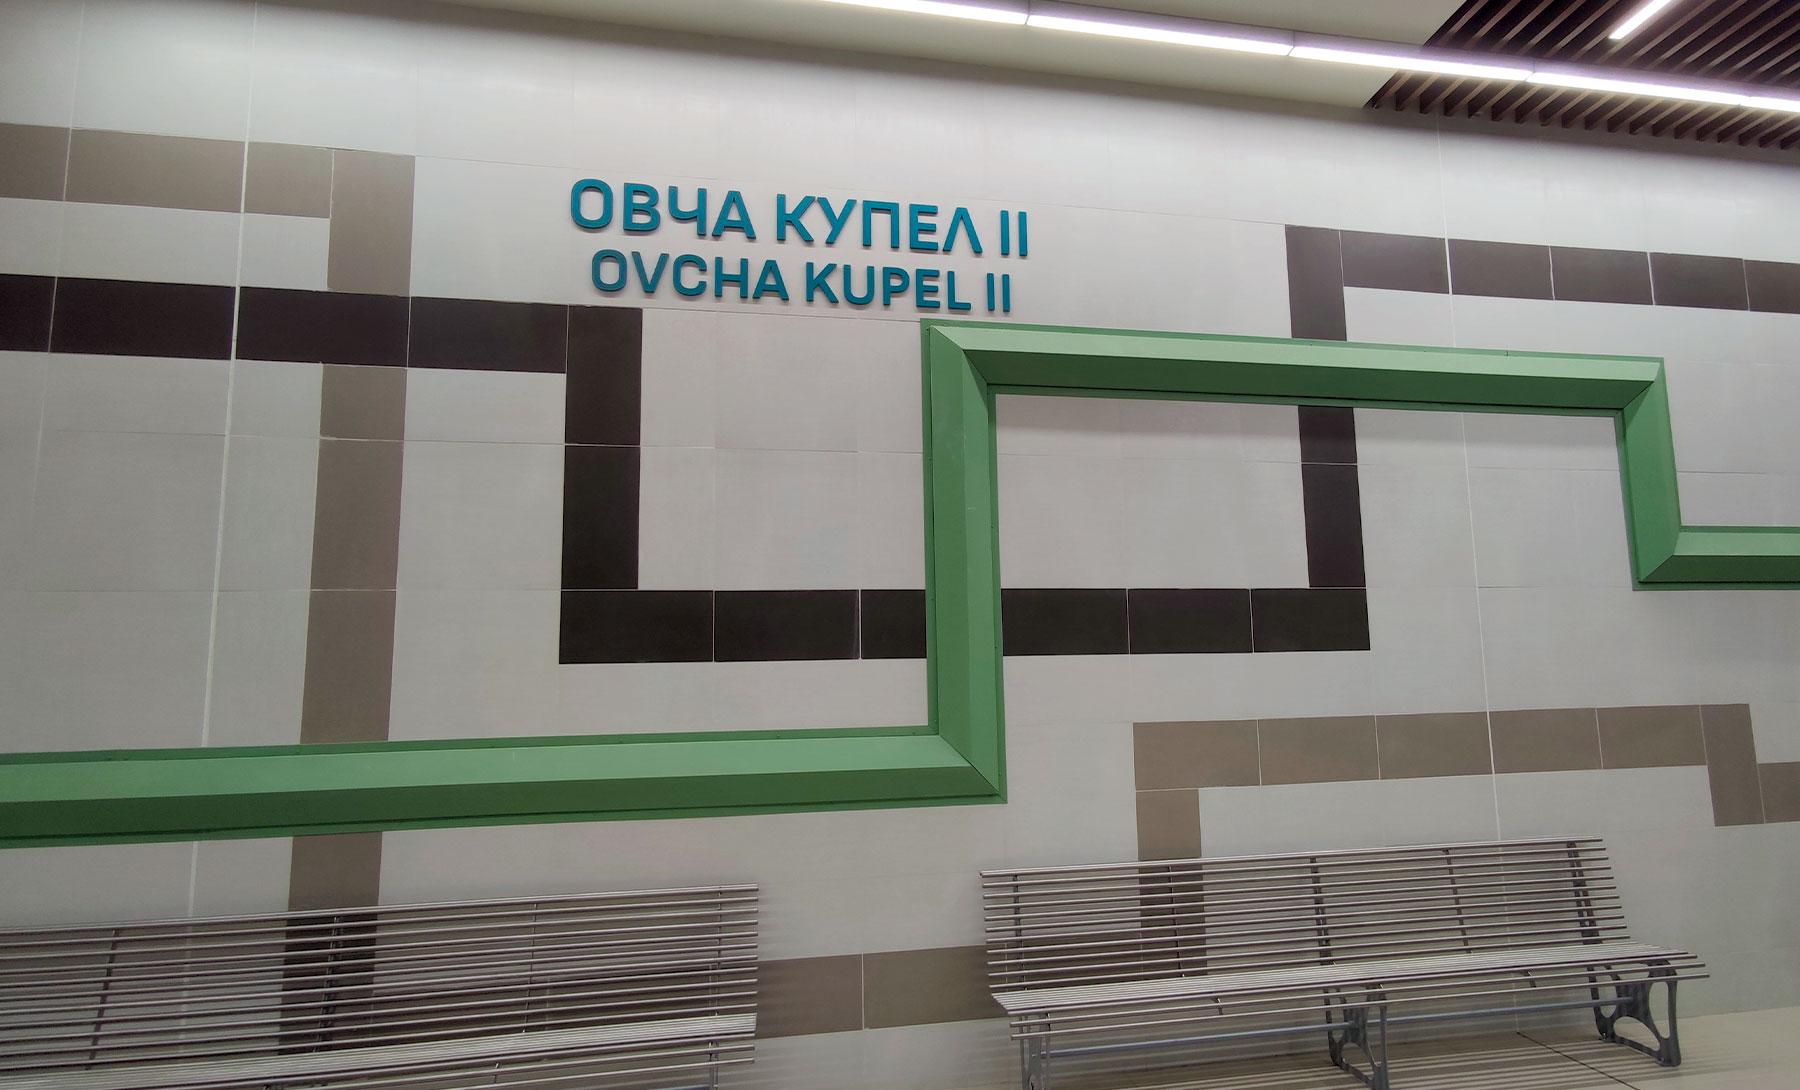 Метростанция Овча купел II